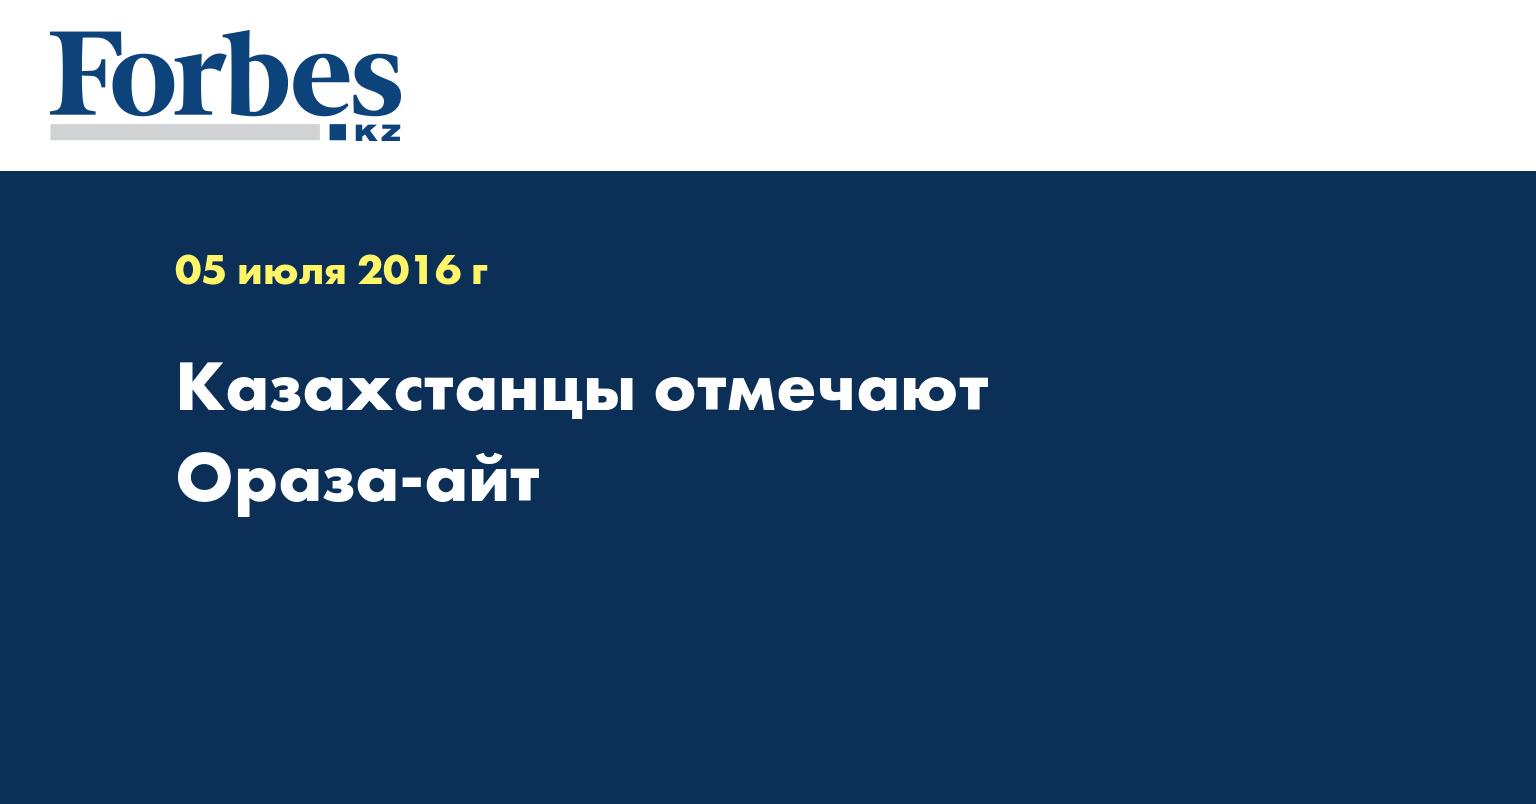 Казахстанцы отмечают Ораза-айт